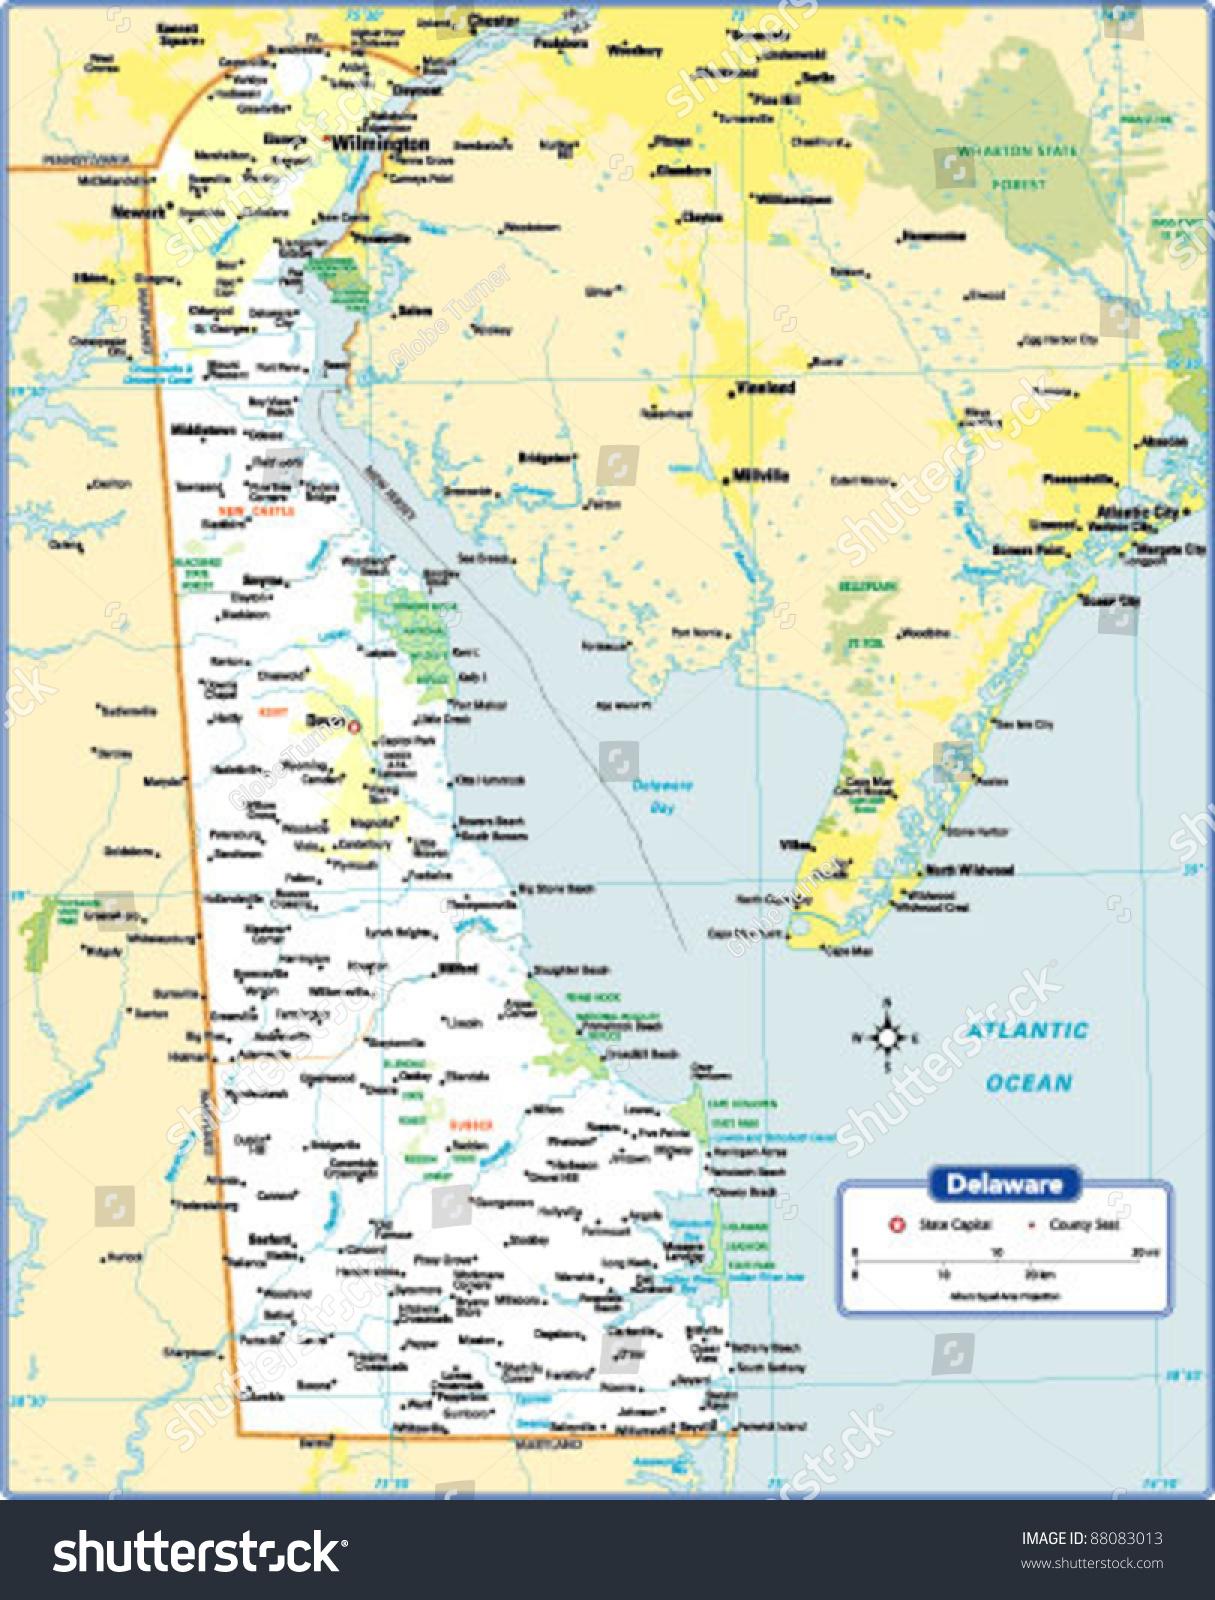 Delaware State Map Stock Vector Shutterstock - Delaware state map